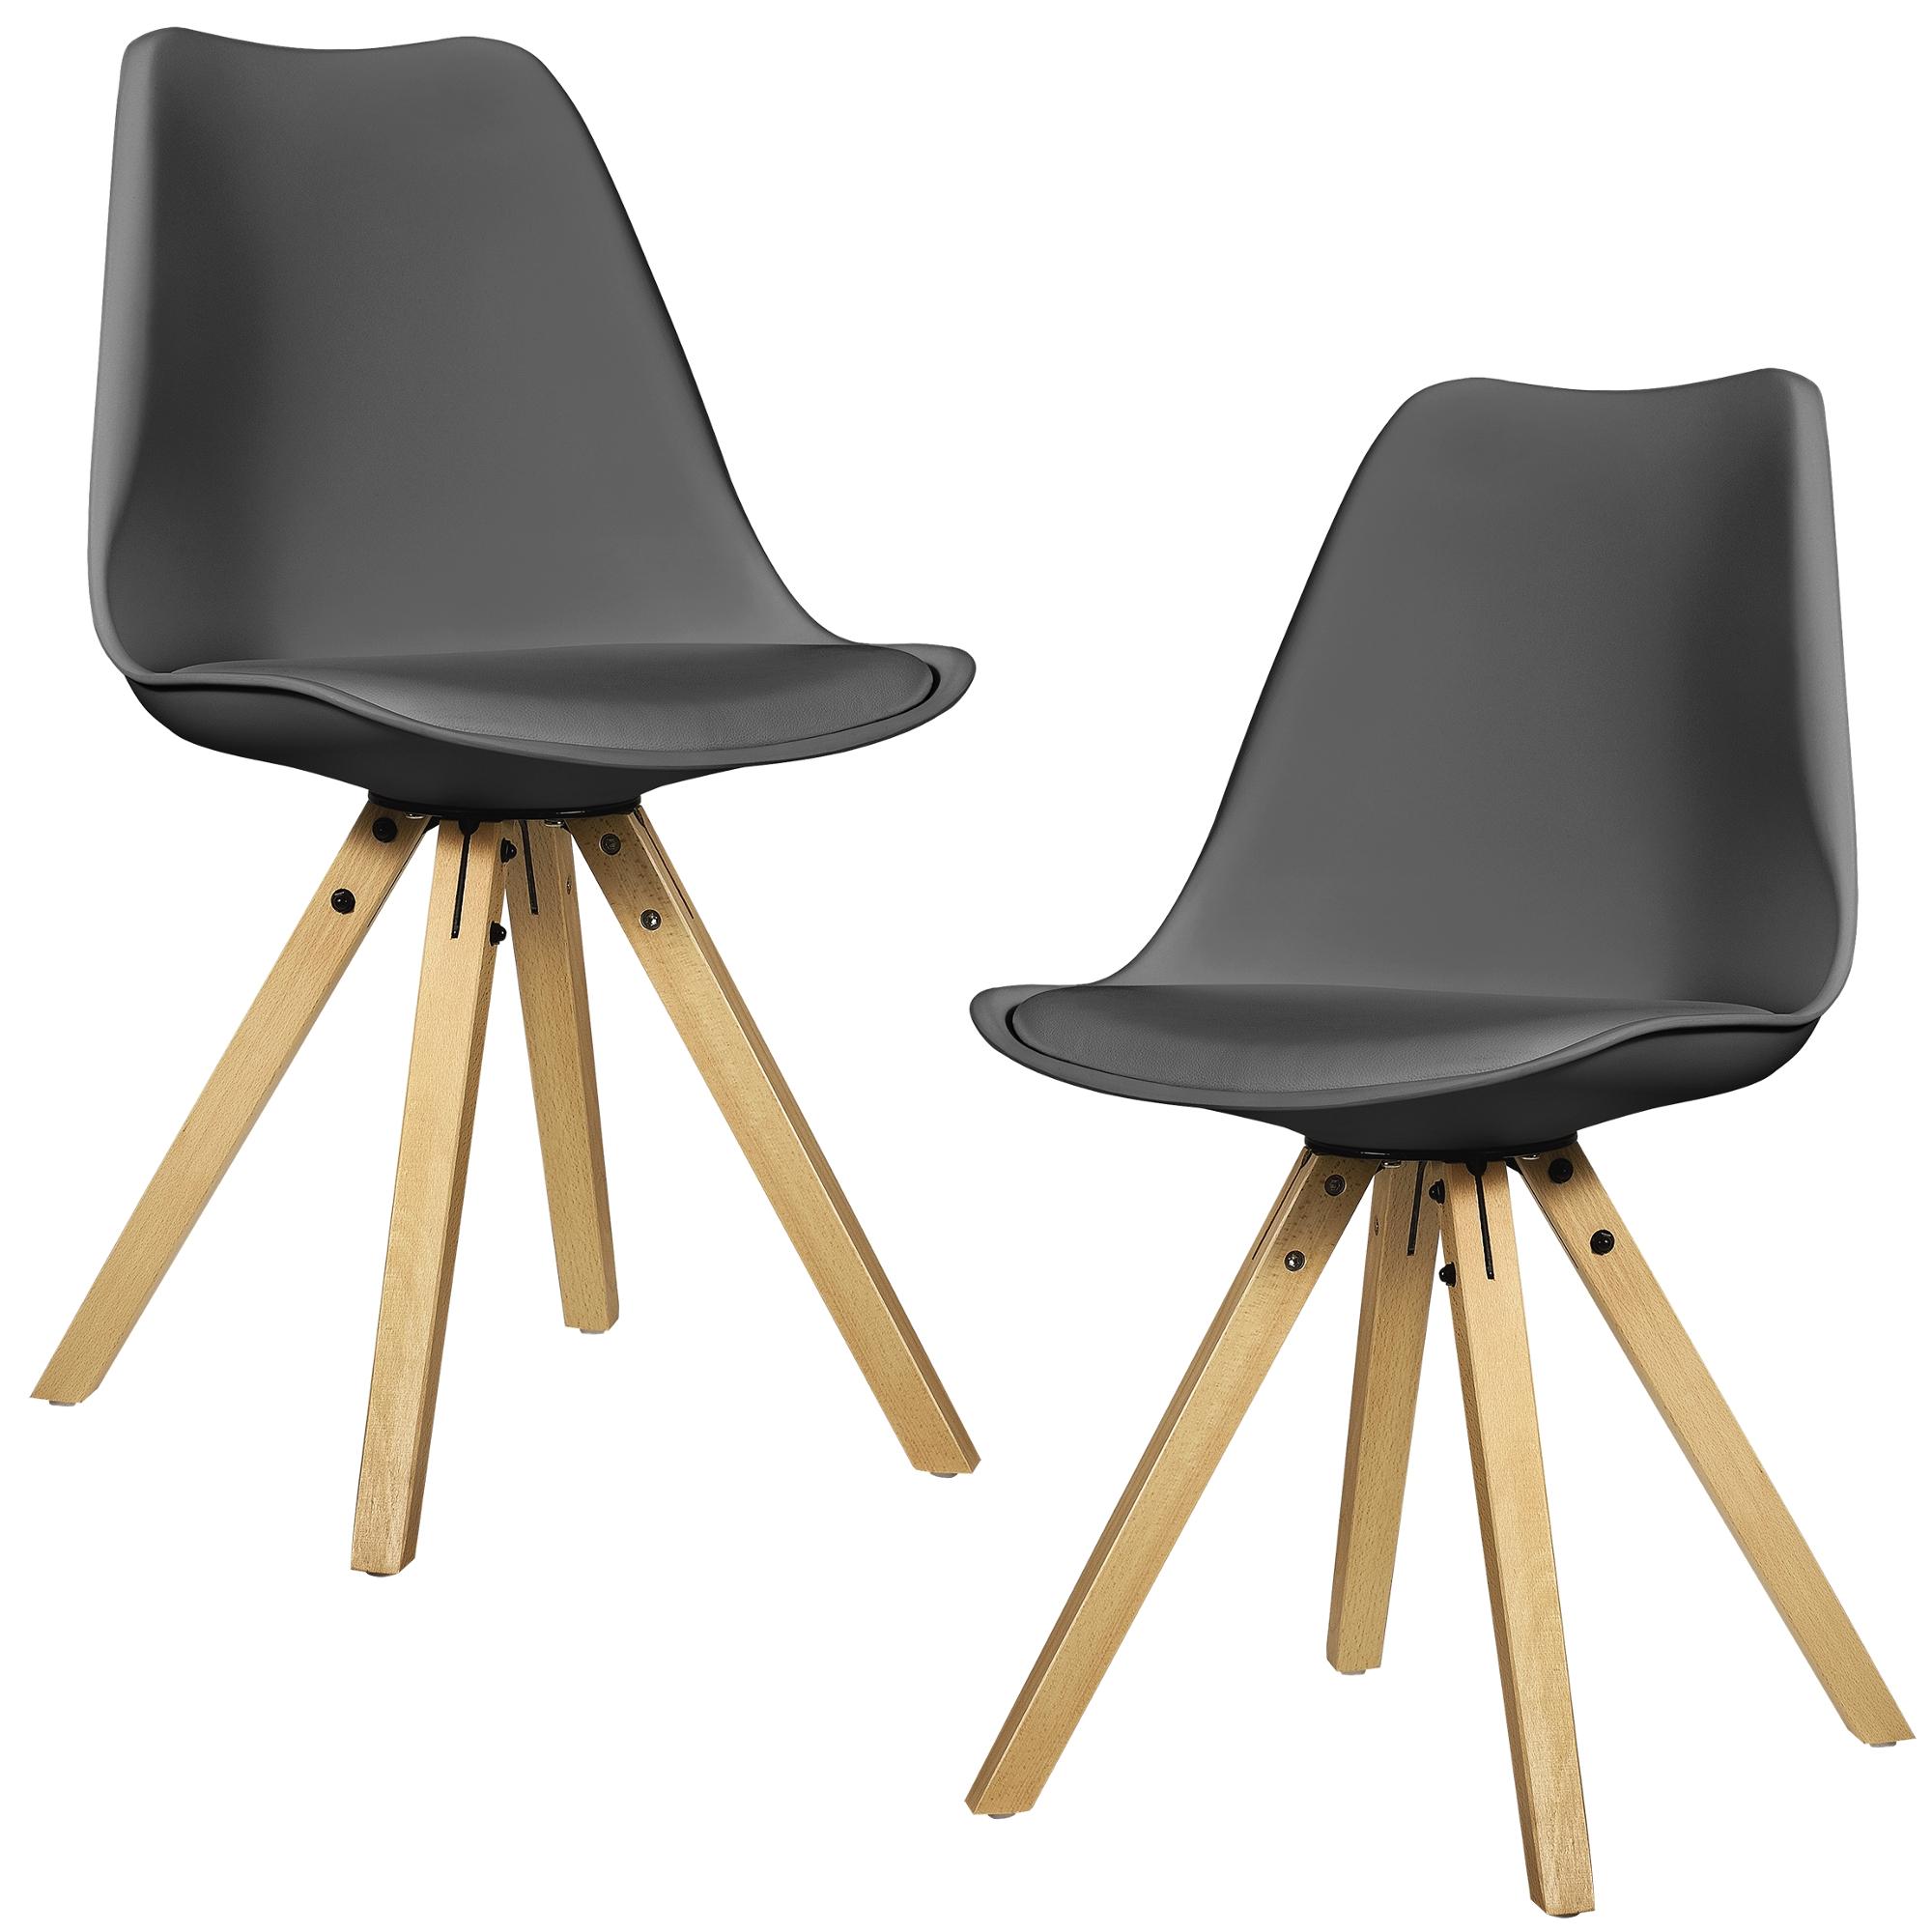 [EN Casa] 6x Design Chairs Dining Grey Chair Wood Plastic